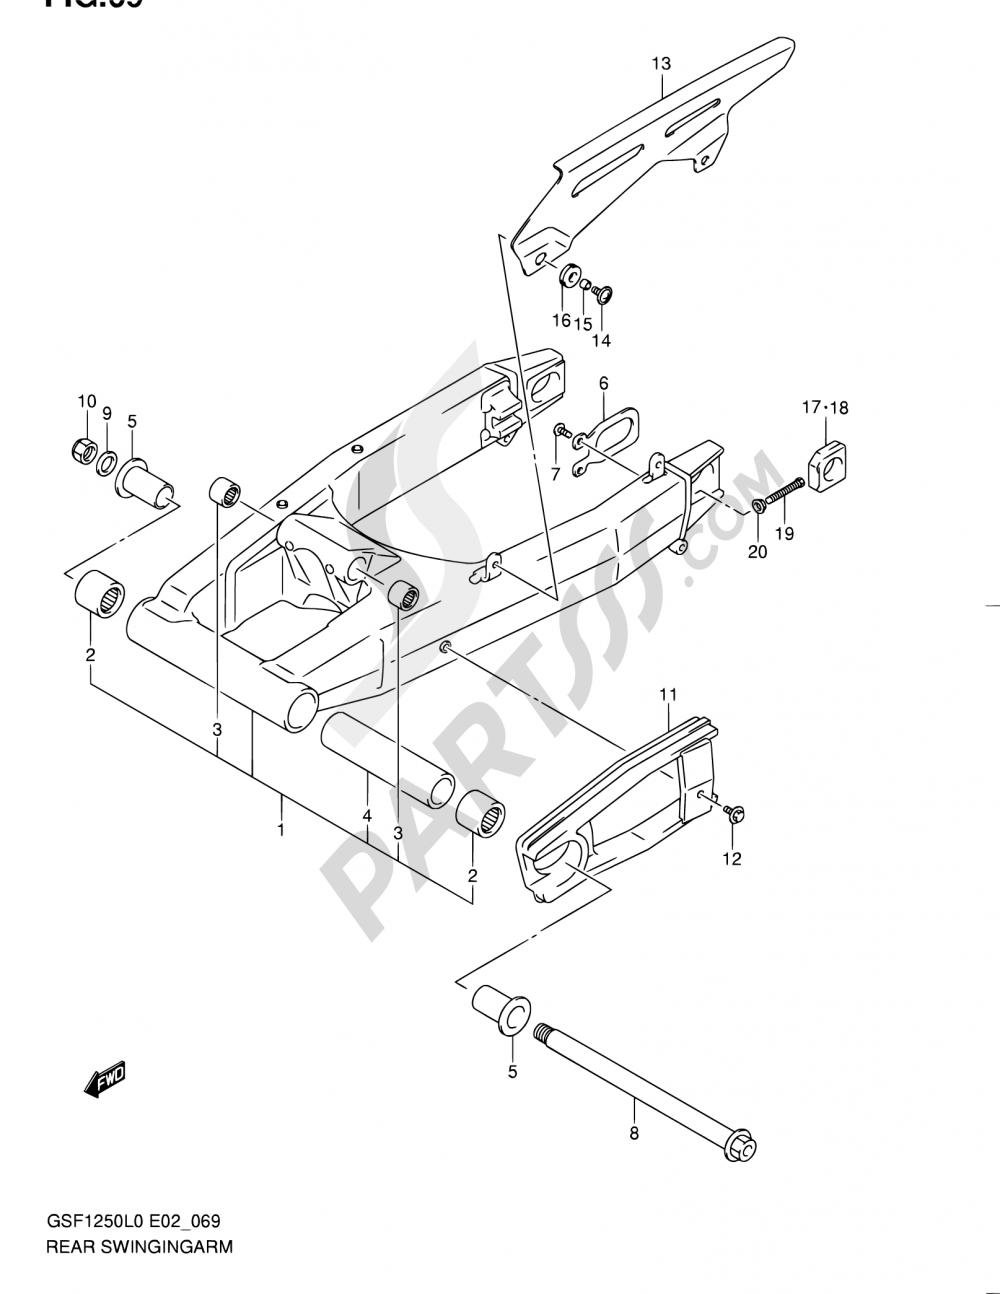 69 - REAR SWINGING ARM Suzuki BANDIT GSF1250 2010